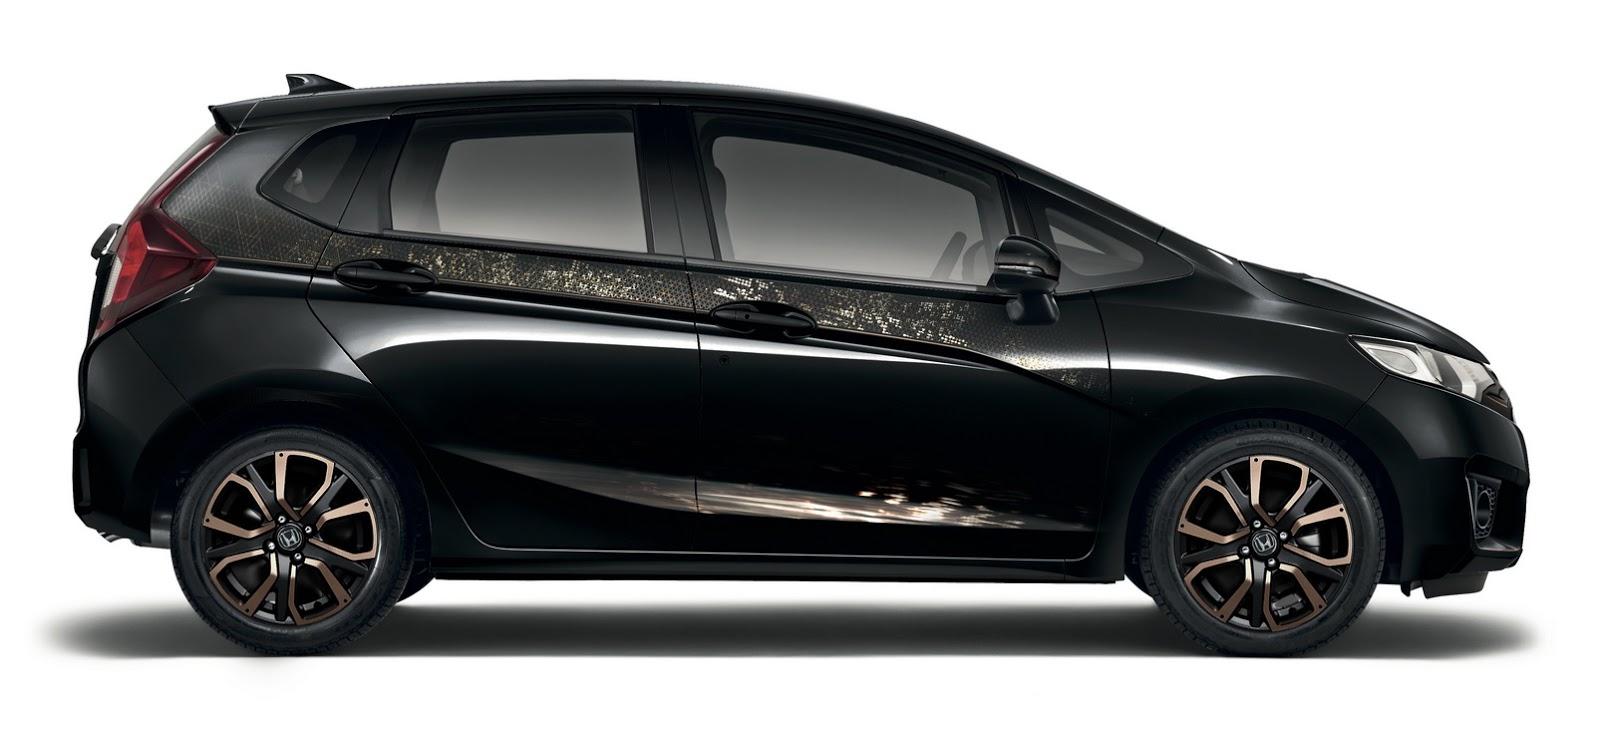 Honda giới thiệu Jazz Keenlight Concept tại Geneva Motor Show 2016